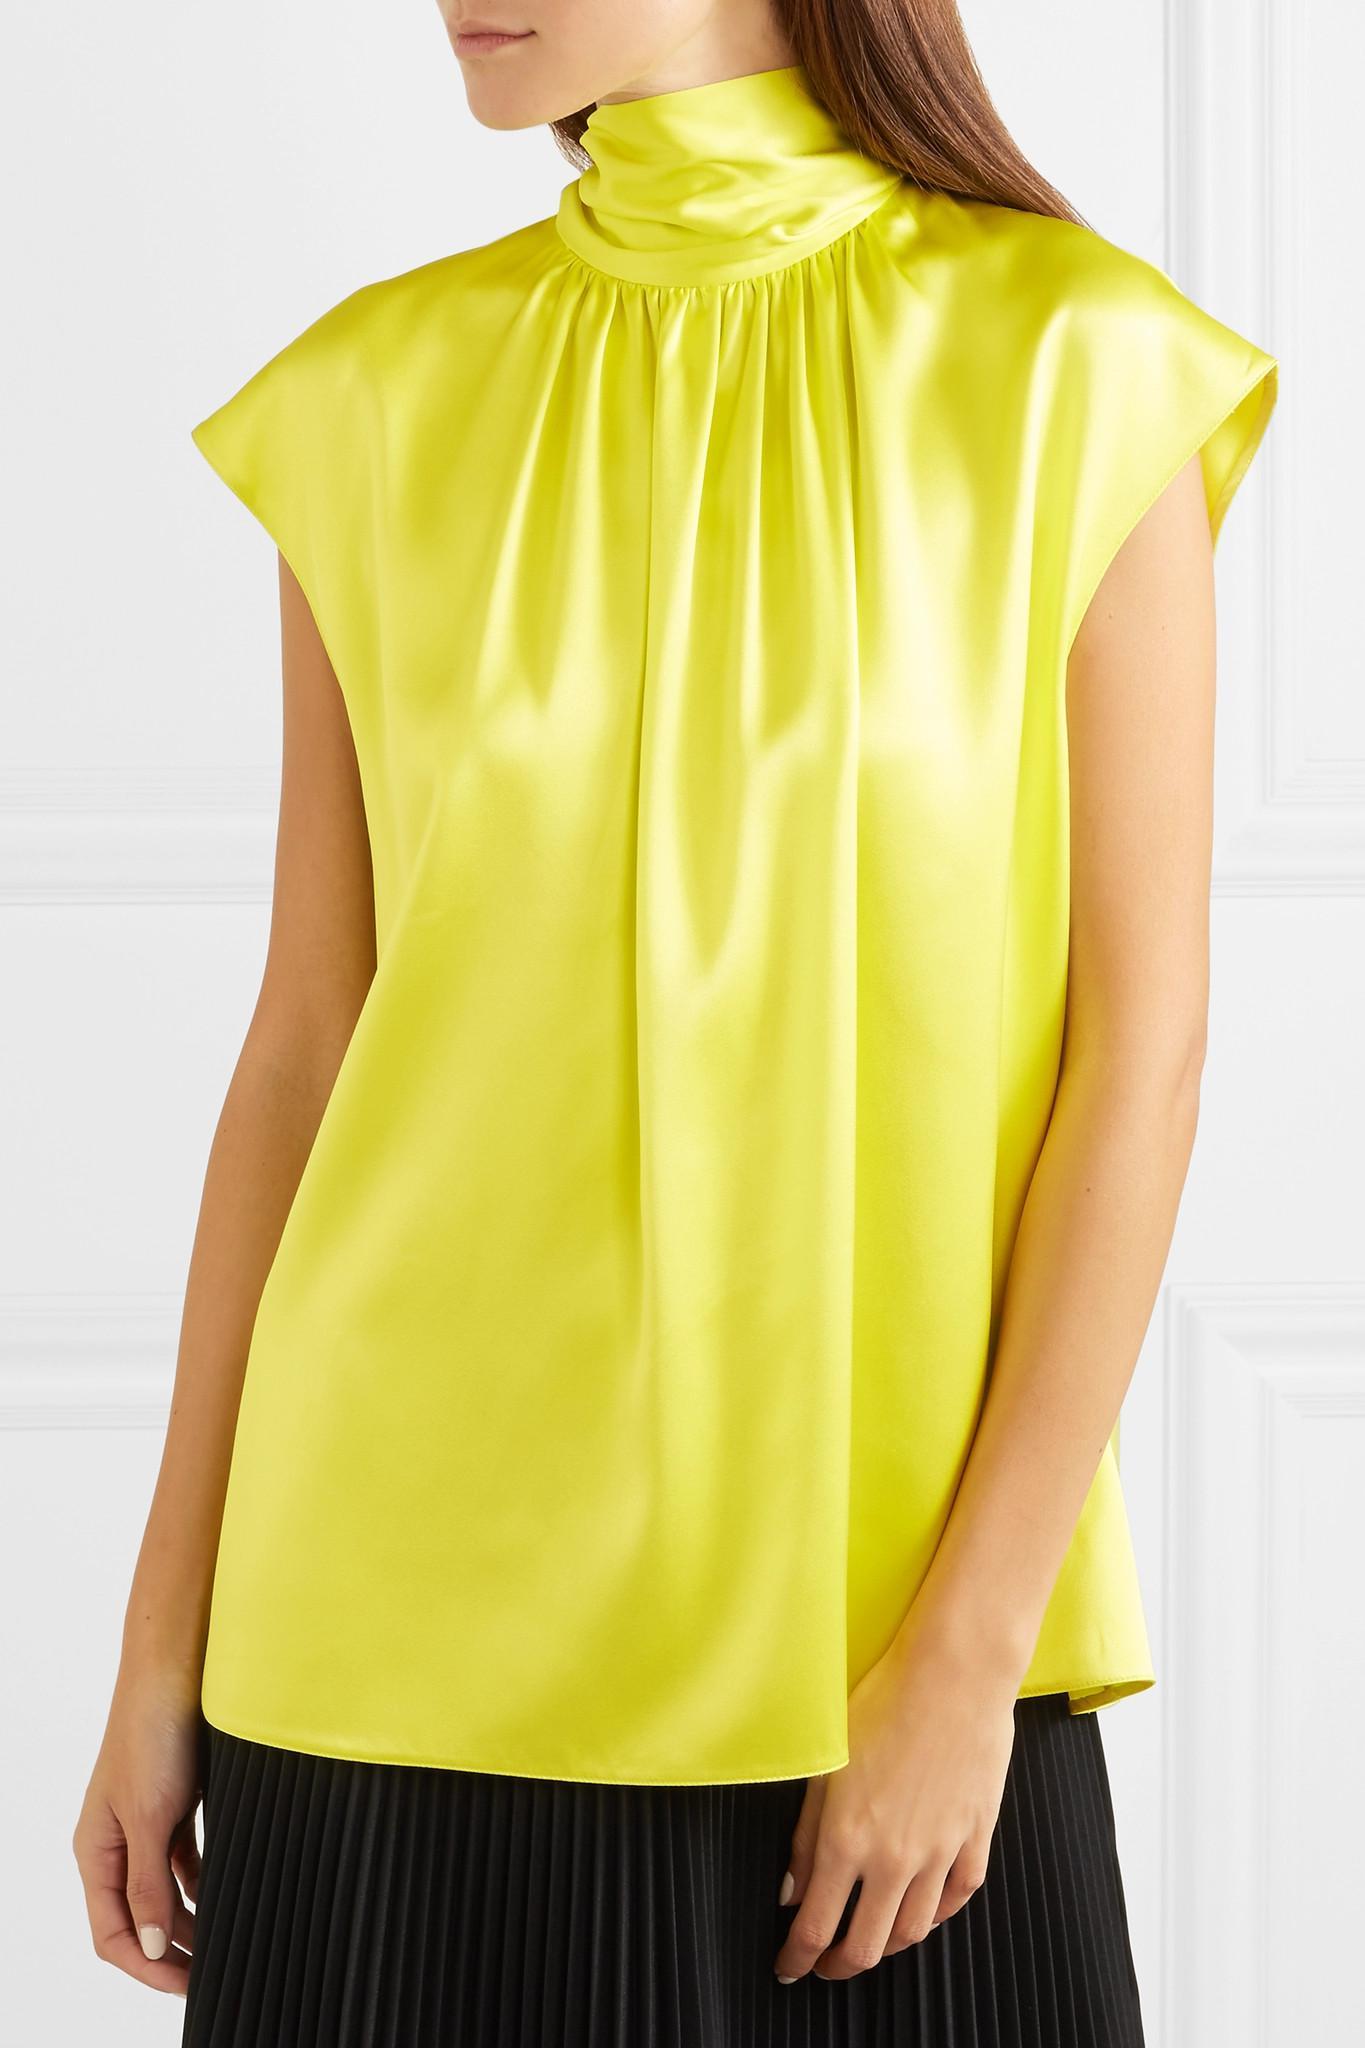 53633cfc0a6a5 Prada - Yellow Gathered Neon Silk-satin Blouse - Lyst. View fullscreen